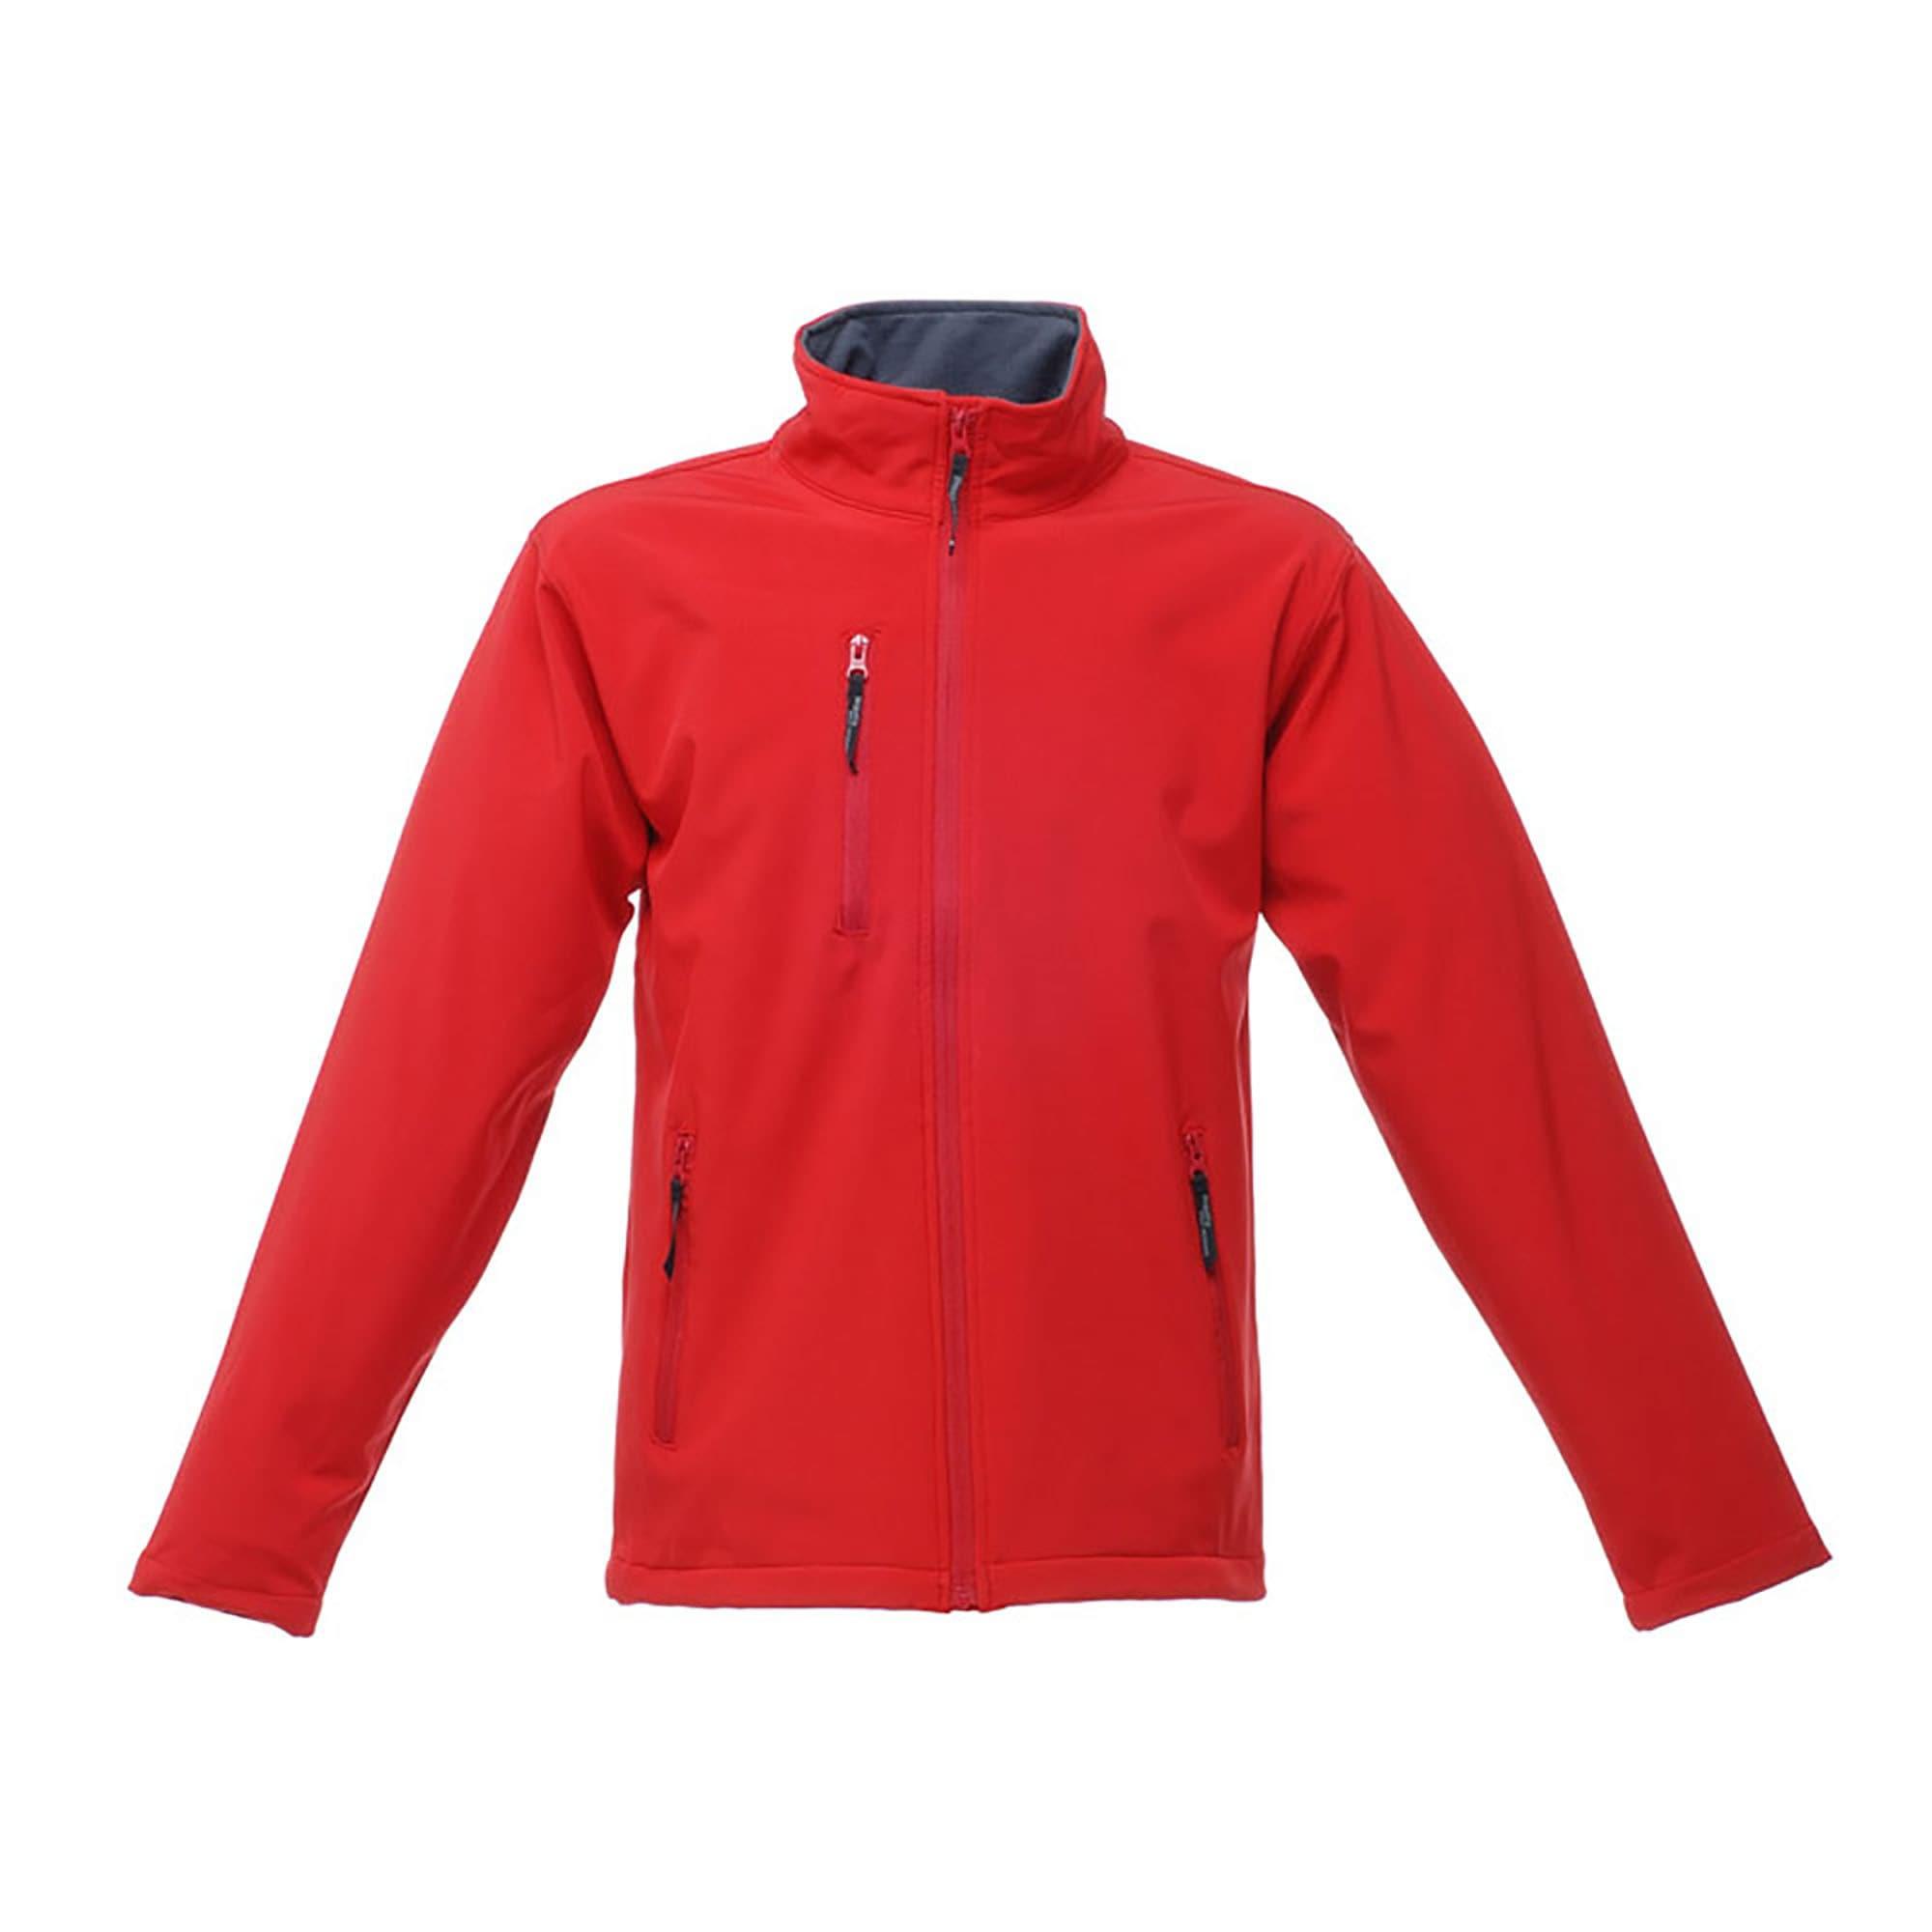 Regatta Softshelljacke Herren Hydroforce Softshell-Jacke 3-lagig wasserdicht atmungsaktiv | Sportbekleidung > Sportjacken > Softshelljacken | Rot | Polyester - Gummi | Regatta